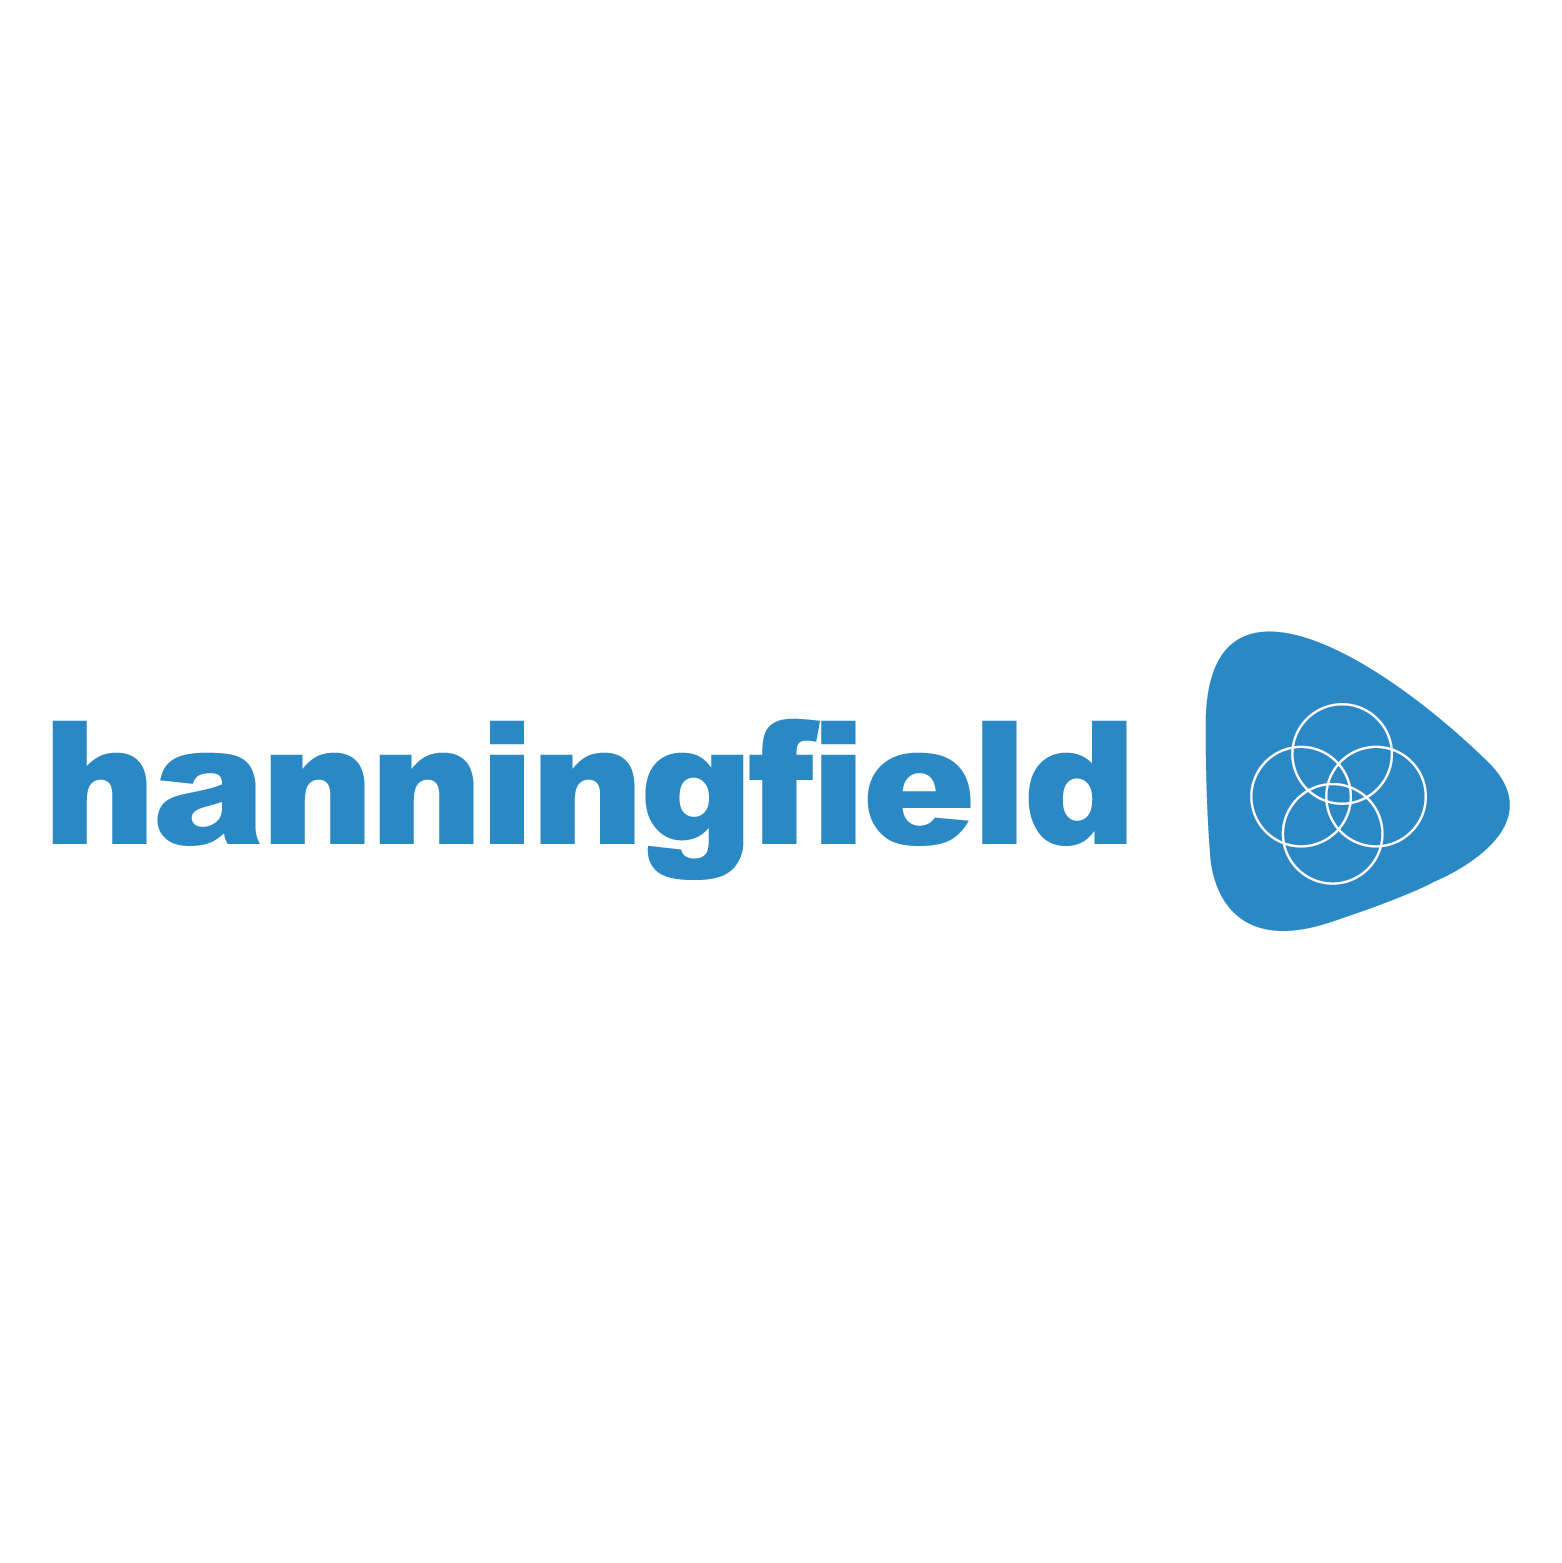 hanningfield logo